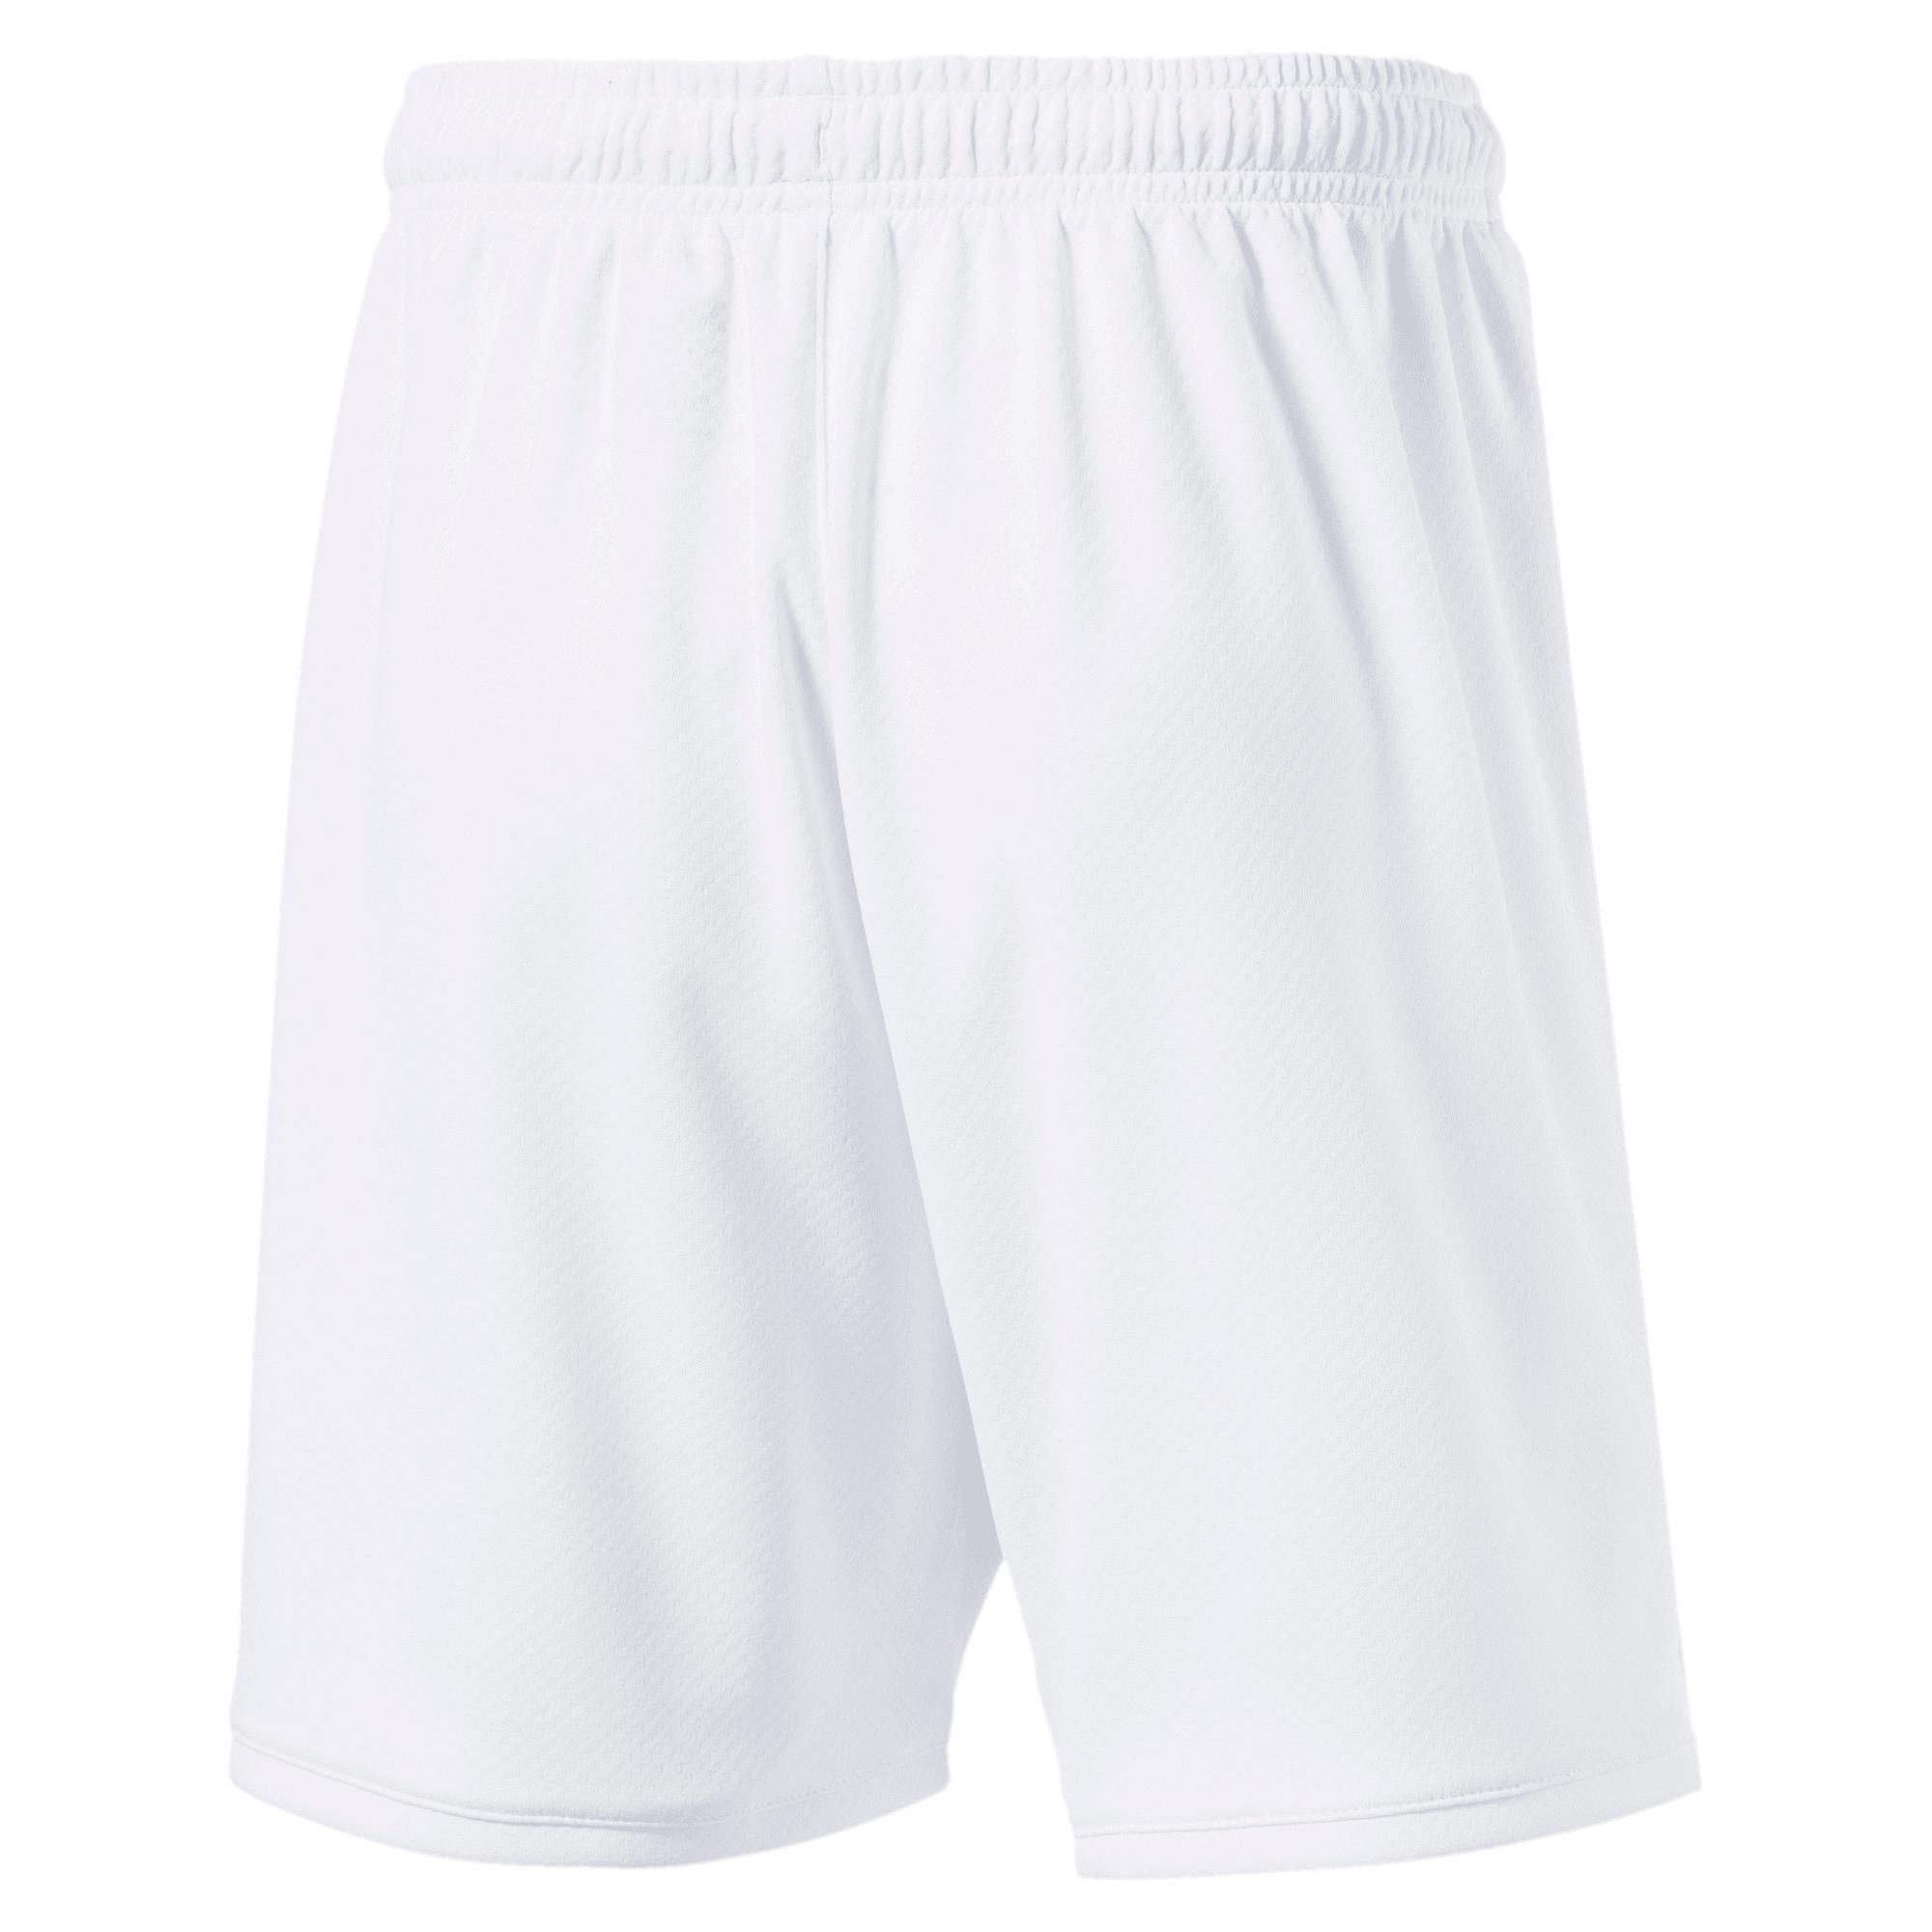 Thumbnail 2 of Borussia Mönchengladbach Boys' Replica Shorts, Puma White, medium